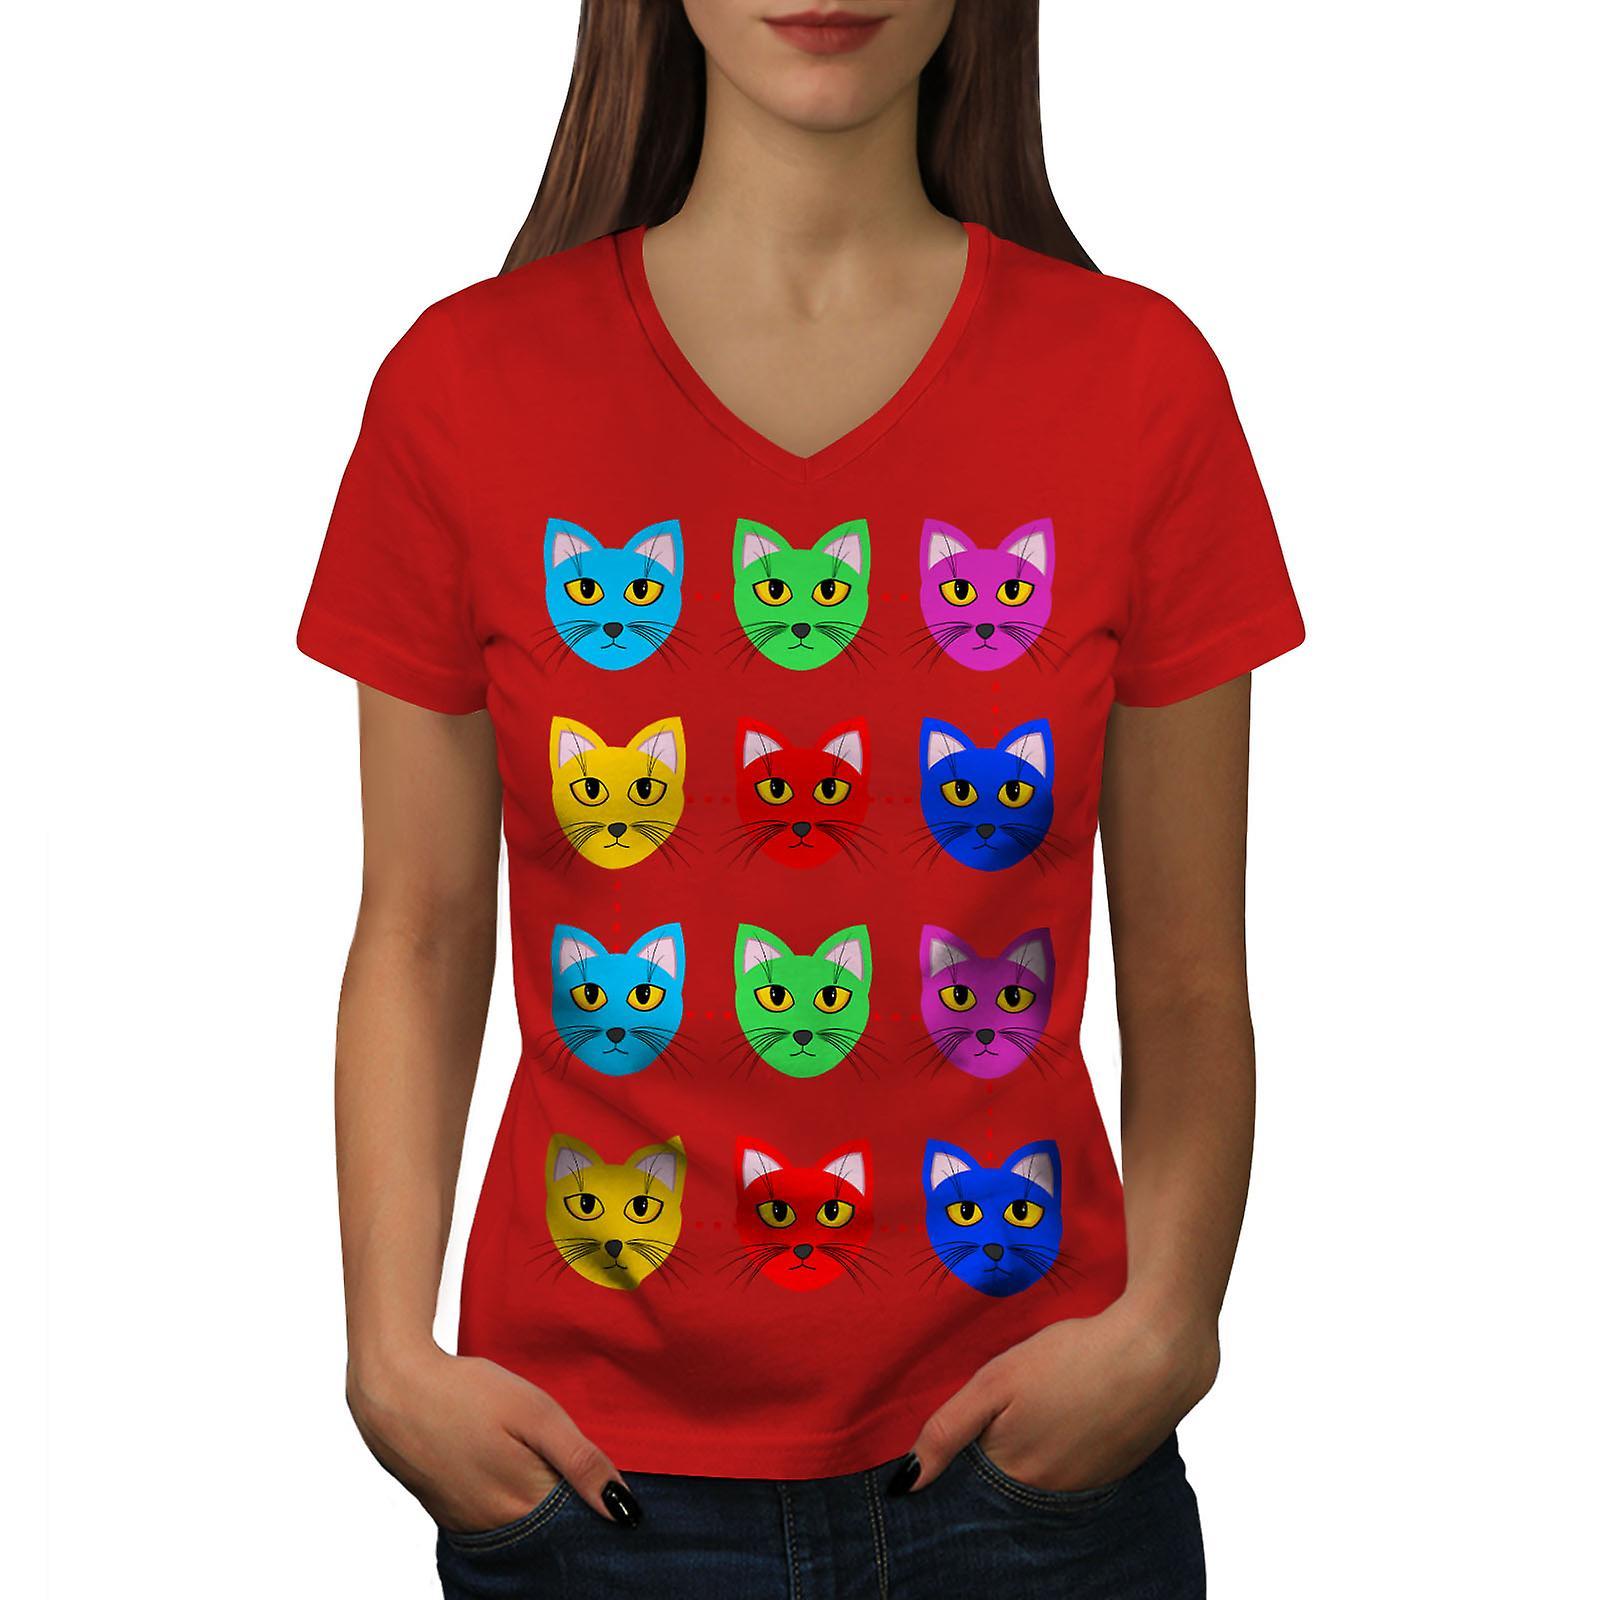 Femmes poilues mignon coloré RedV-Neck T-shirt | Wellcoda